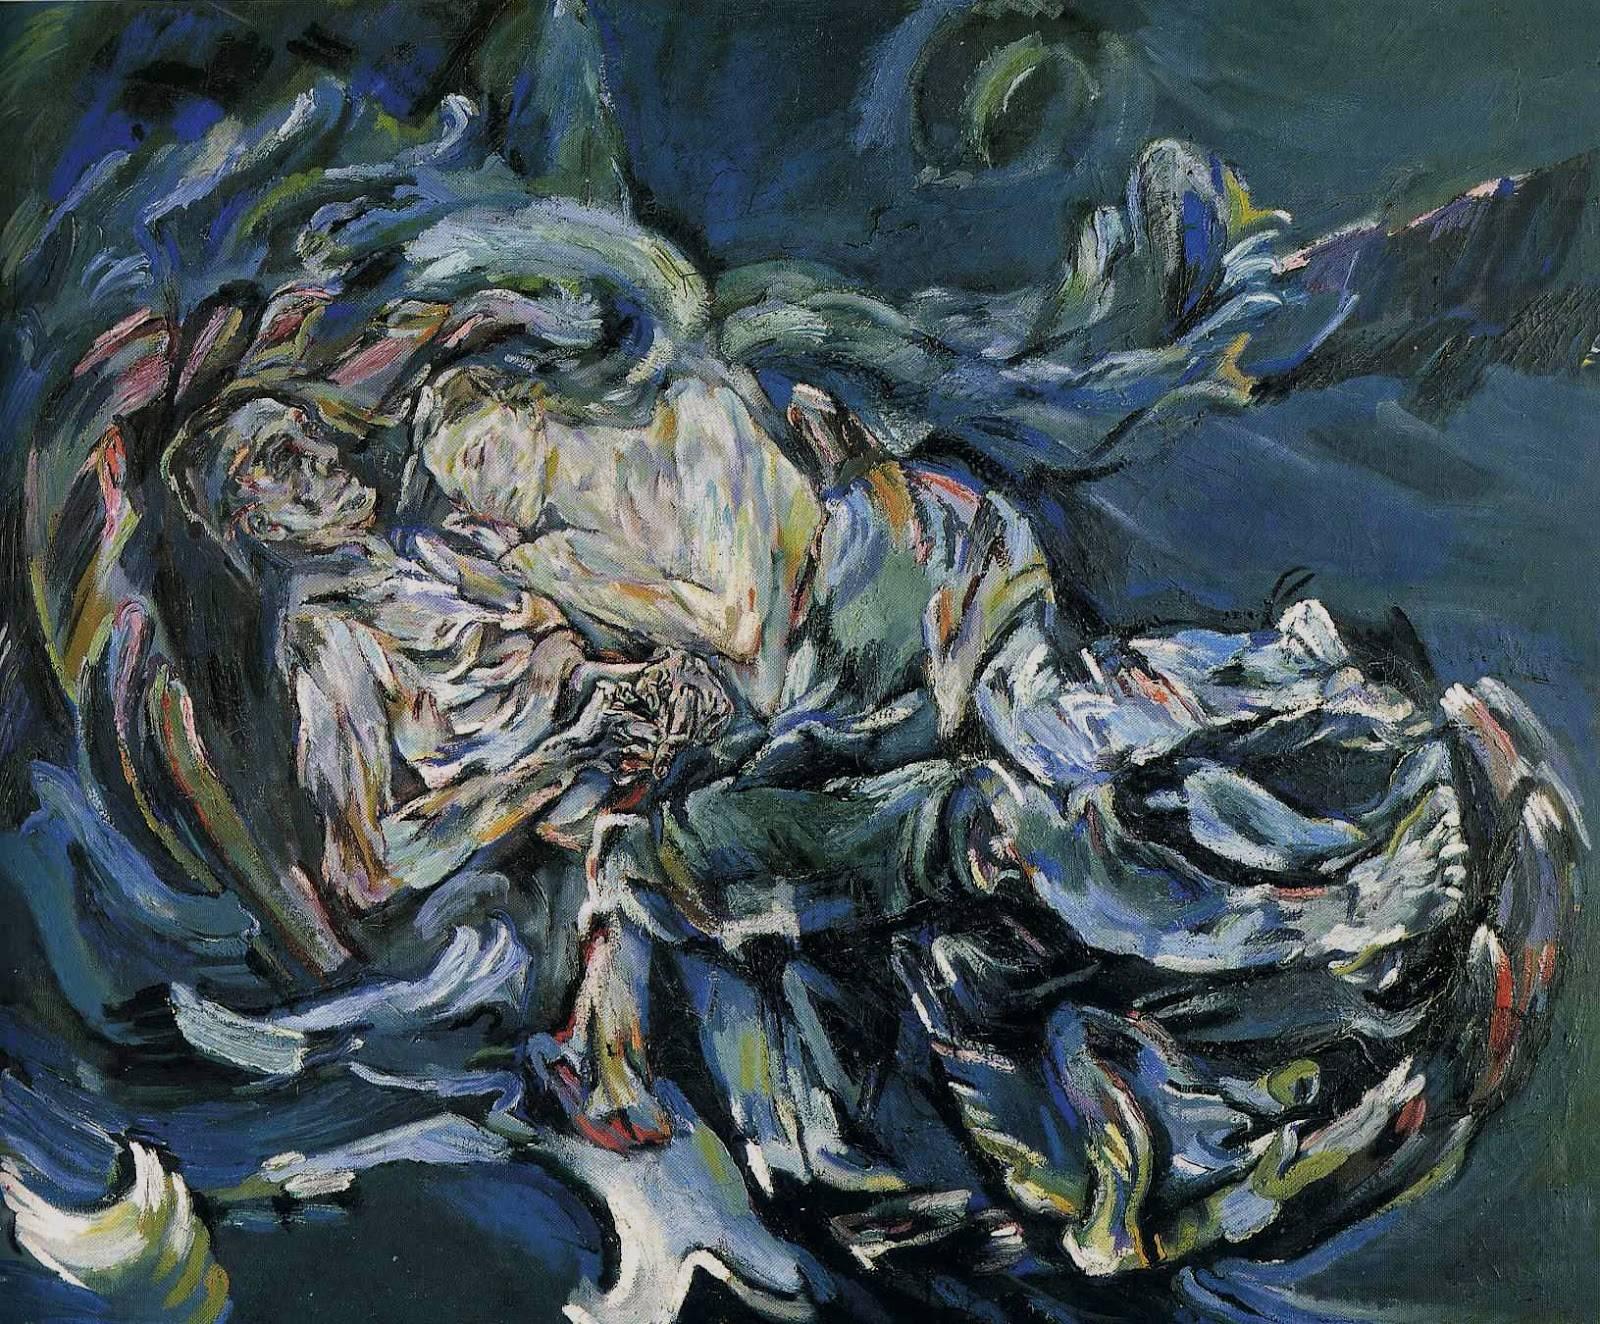 La novia del viento (The bride of the wind, Oskar Kokoschka, 1913-14)